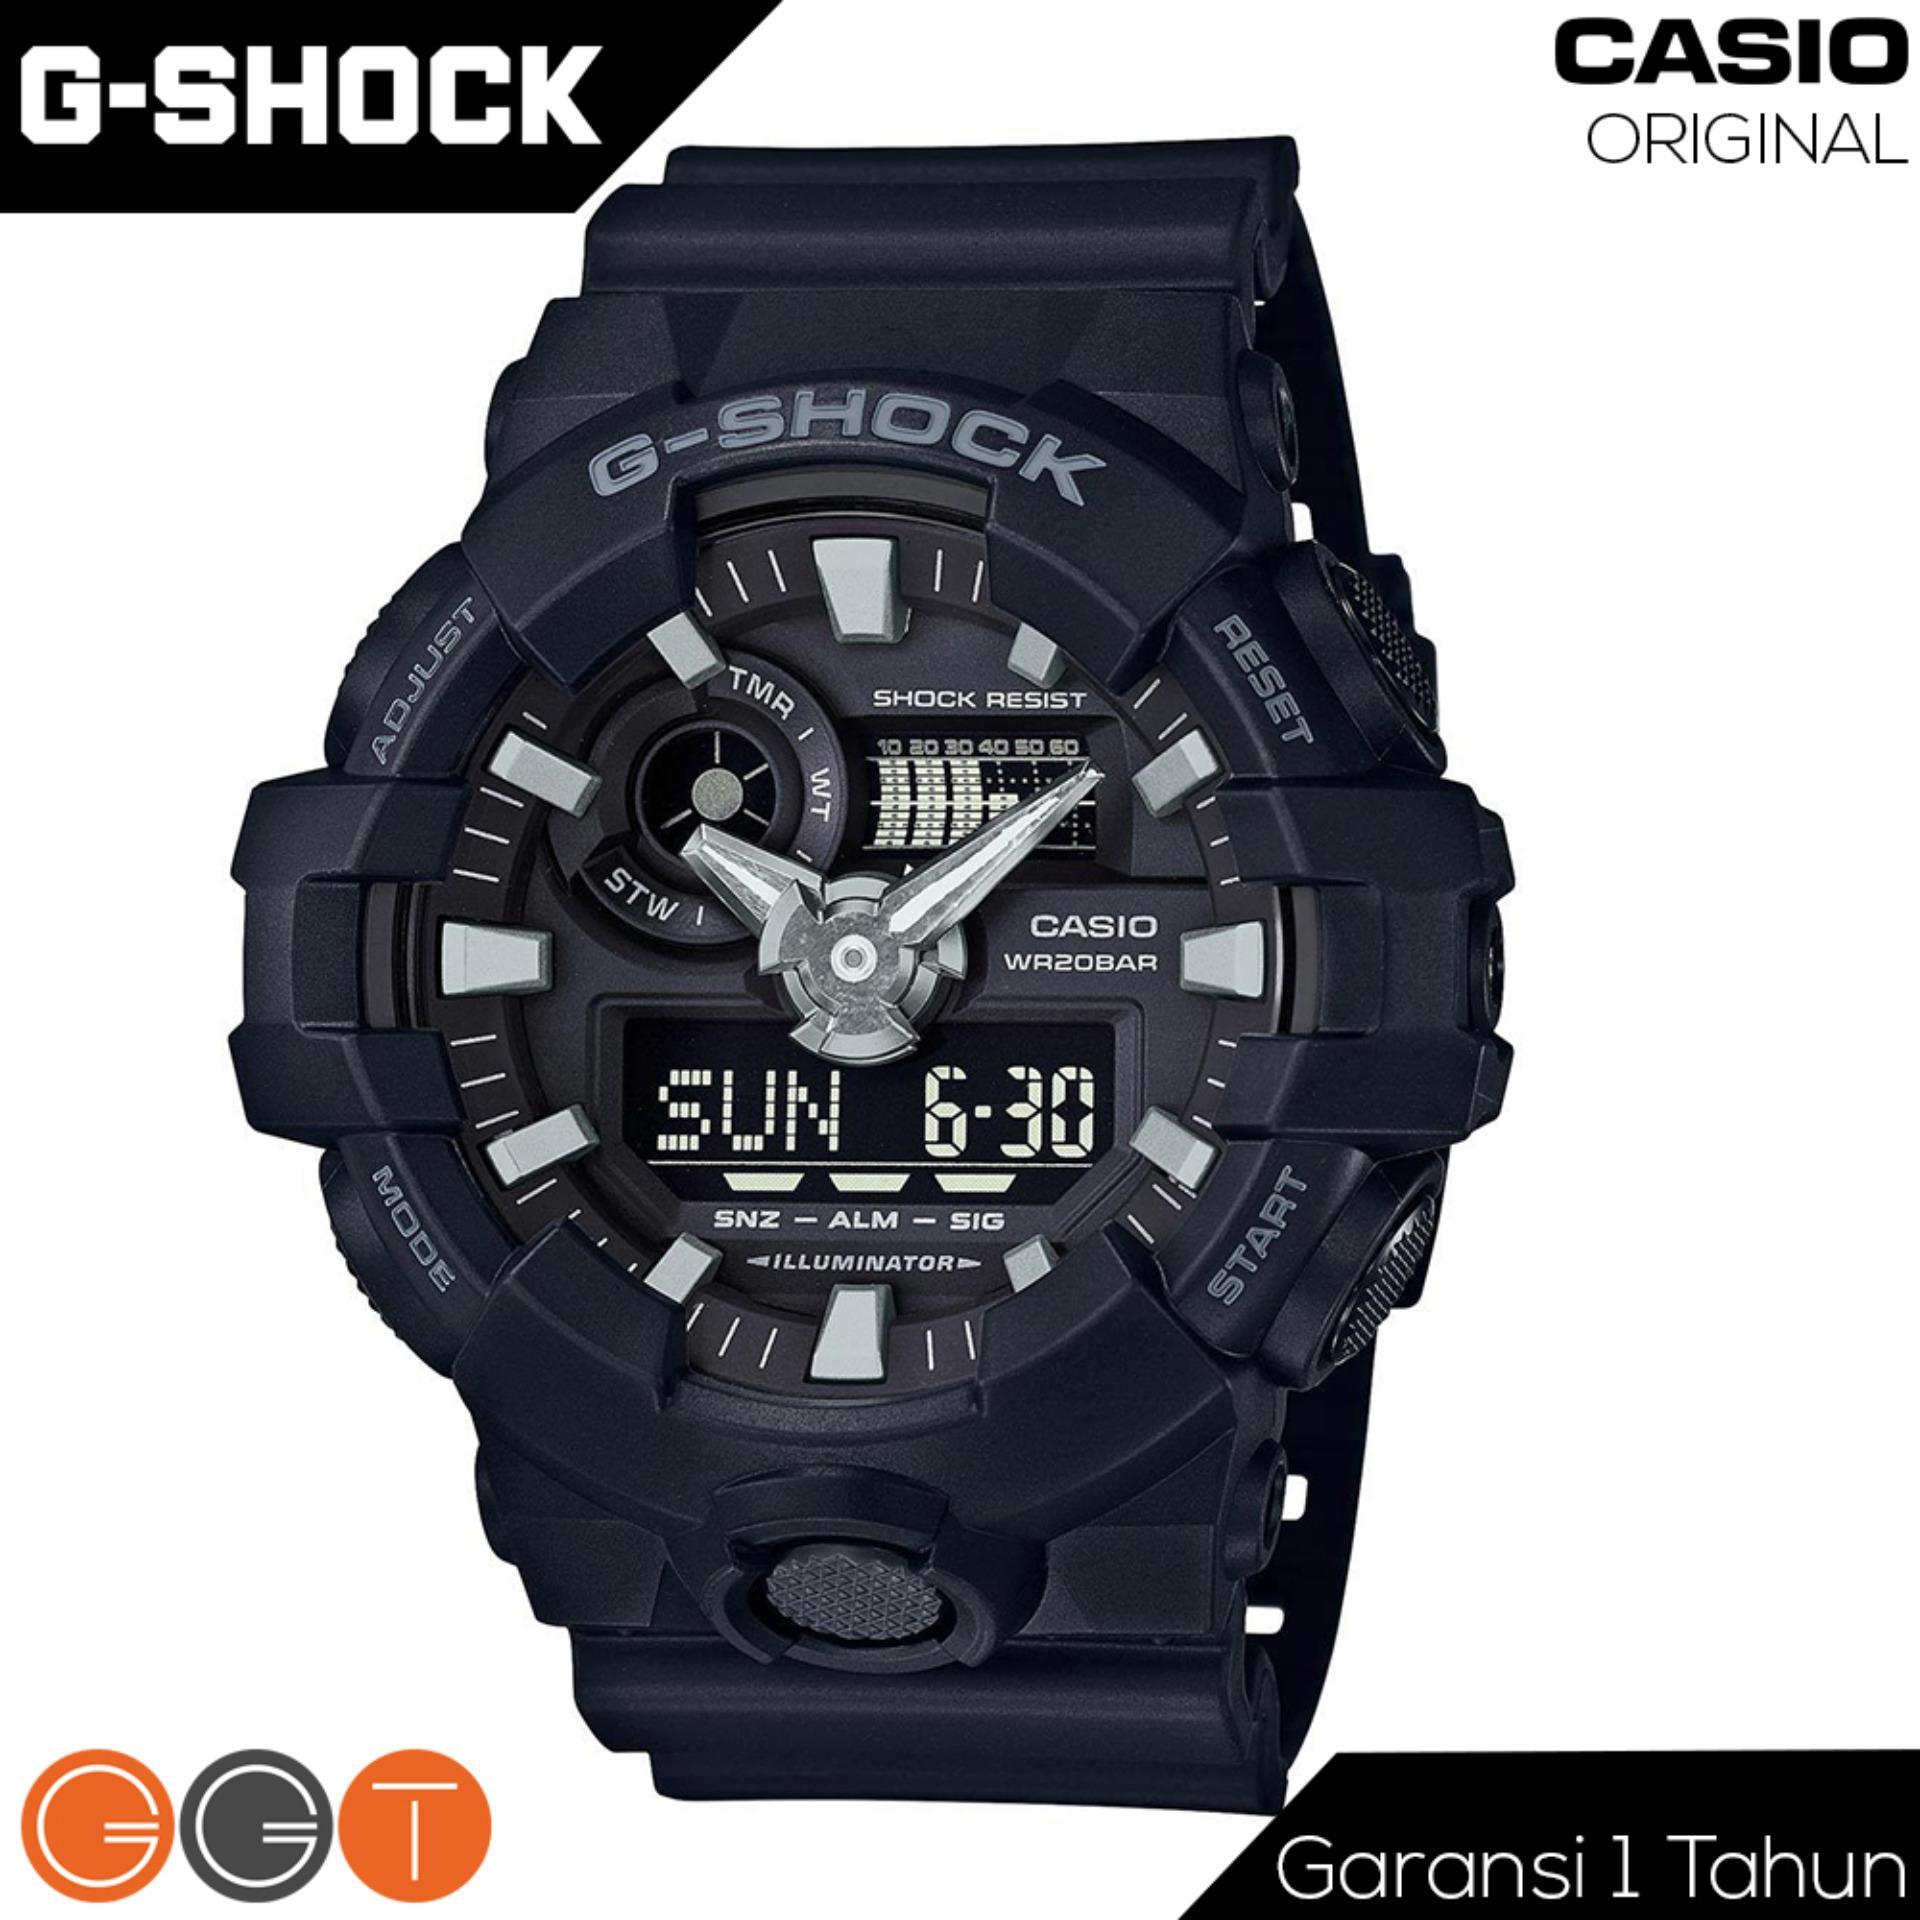 Casio G-Shock Dual Time - Tali Rubber Resin- Quartz Movement - Jam Tangan Pria - GA-700 Series